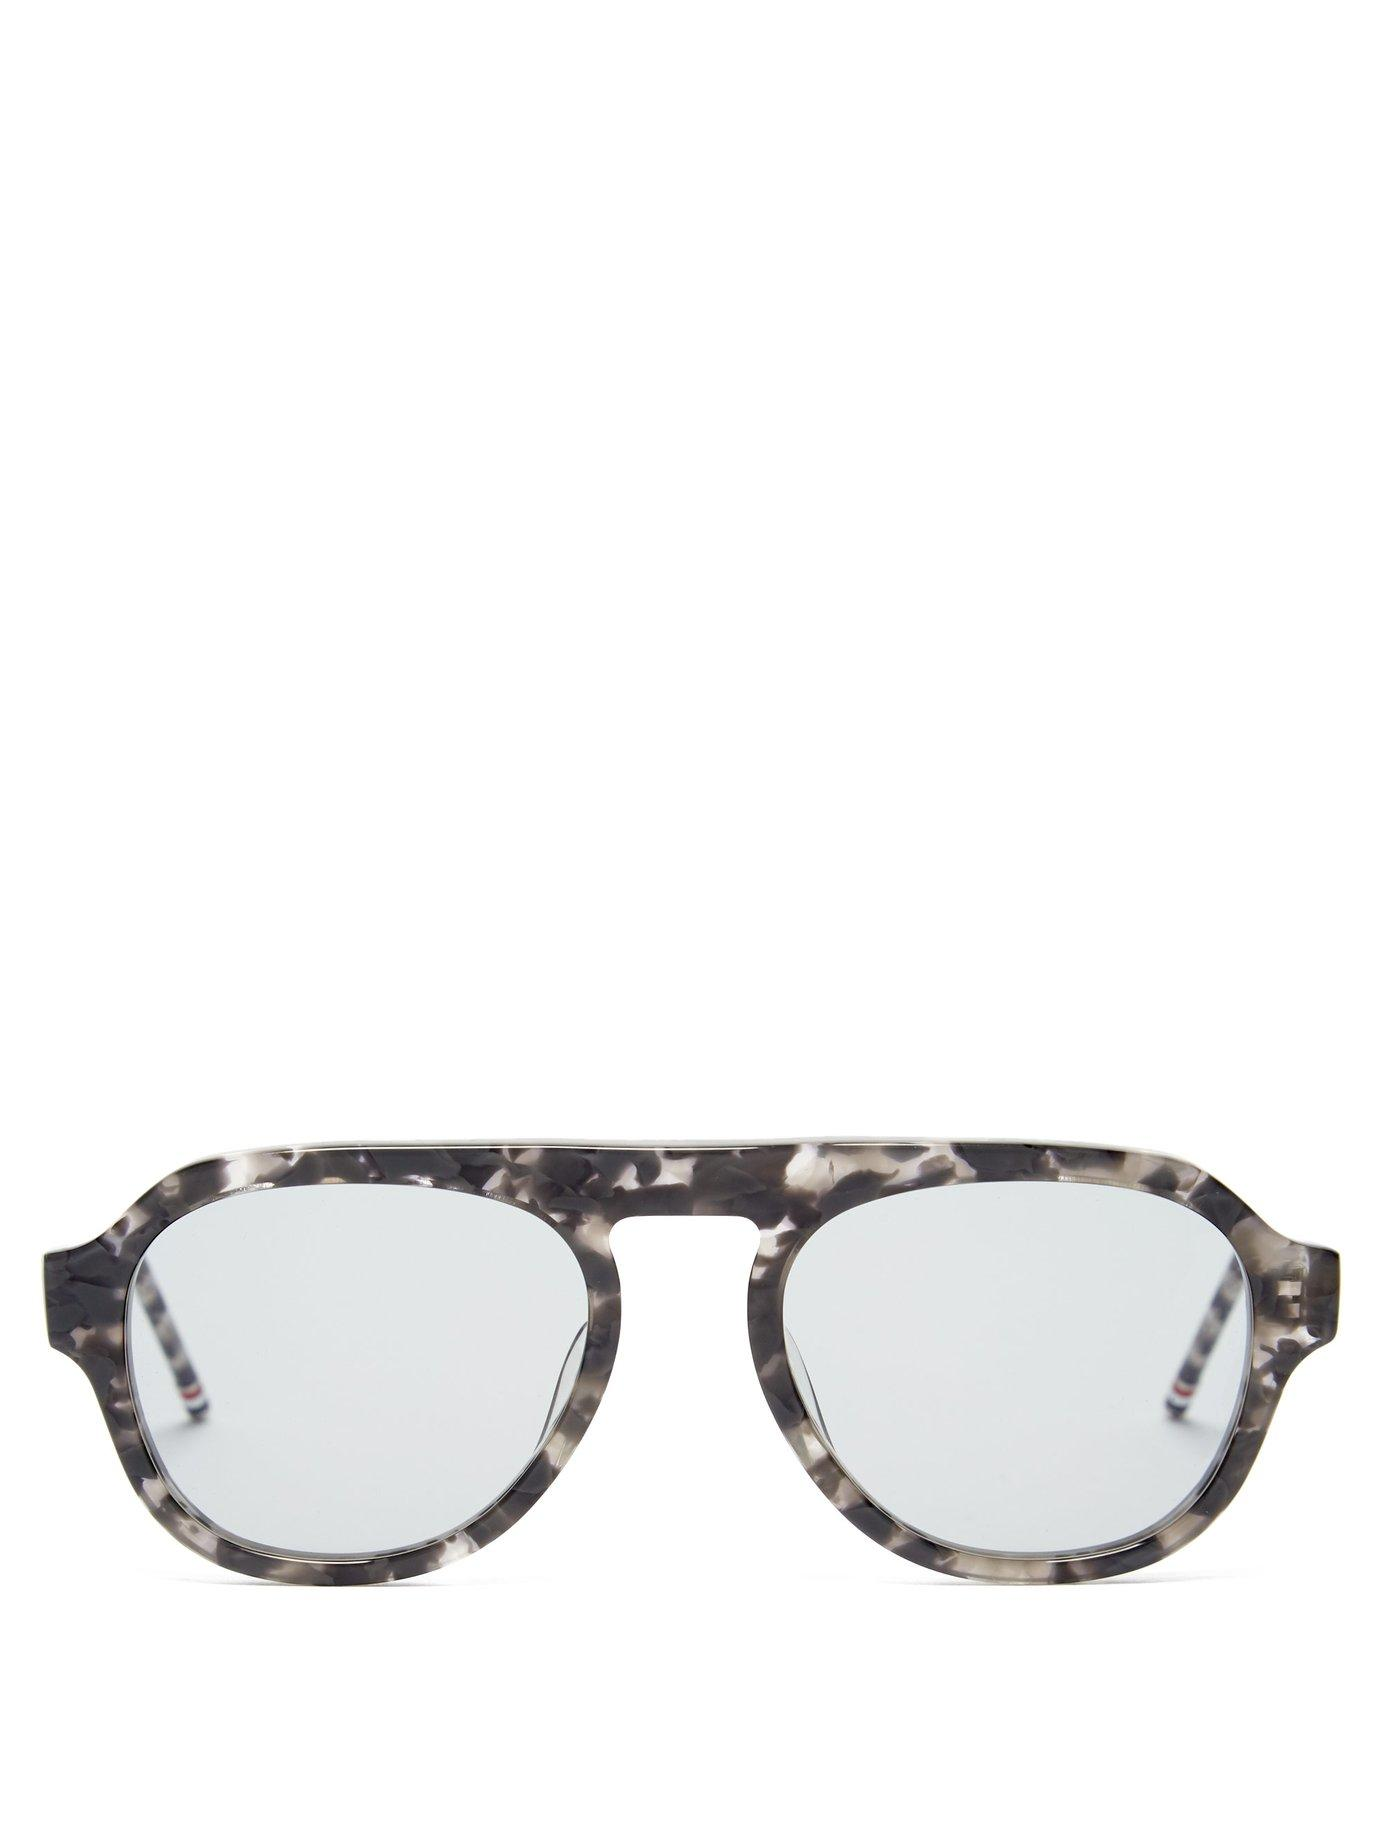 4f44185d4c7 Lyst - Thom Browne Tortoiseshell Acetate Aviator Sunglasses in Gray ...